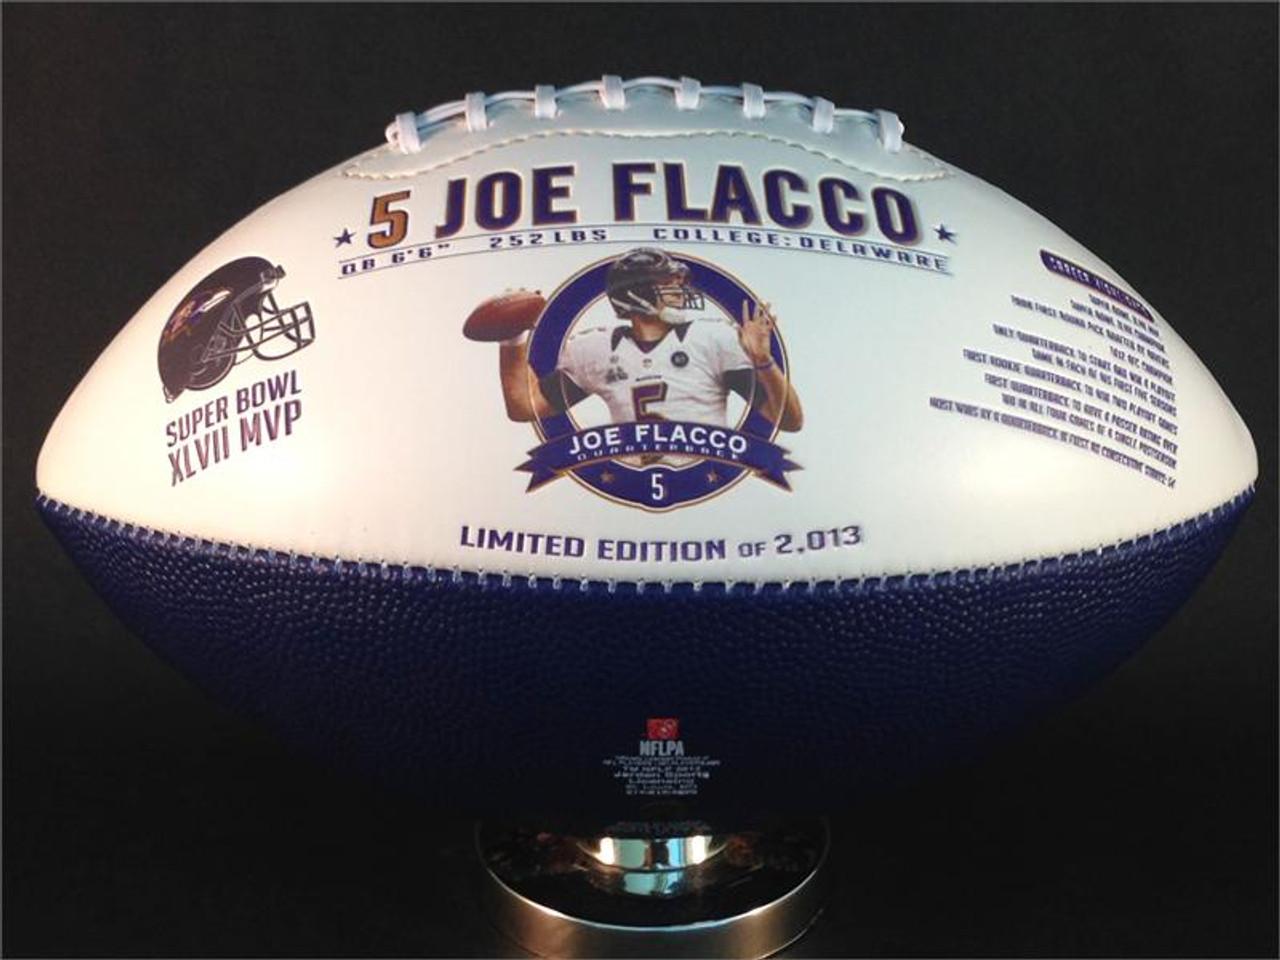 e901c36da97 Joe Flacco Super Bowl MVP & Baltimore Ravens Franchise/Stadium History  Football